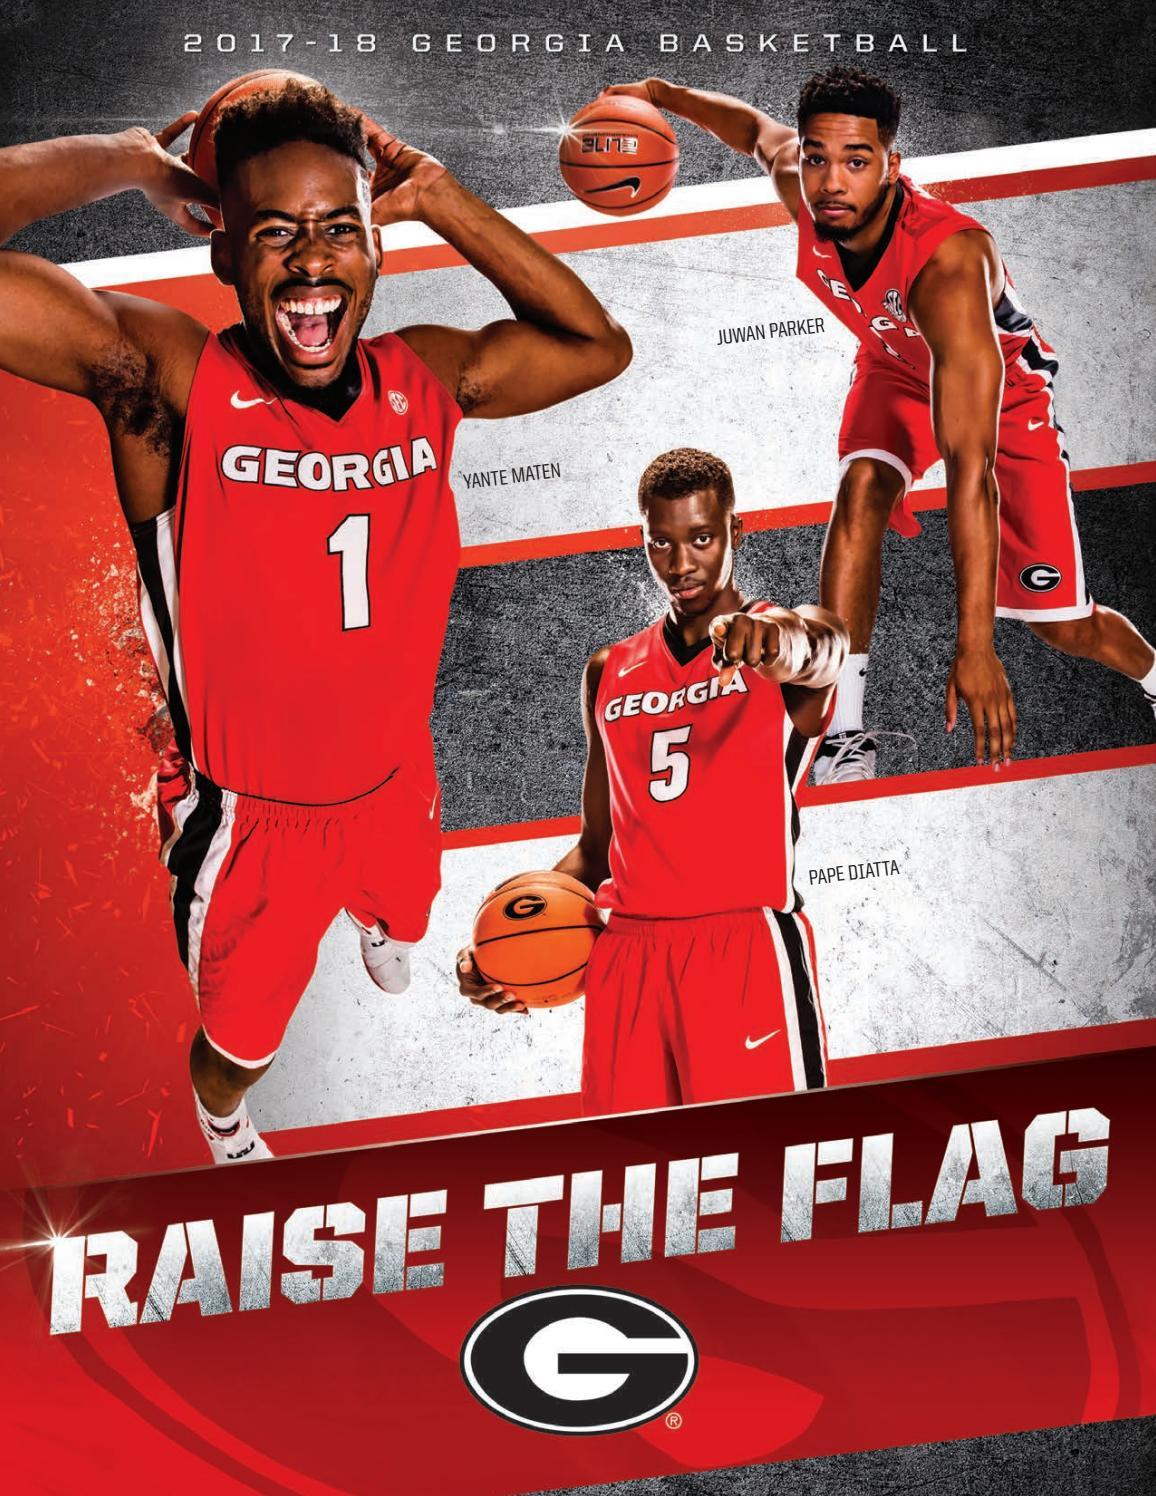 2017-18 Georgia Men s Basketball Media Guide by Georgia Bulldogs Athletics  - issuu 9df4de8b8